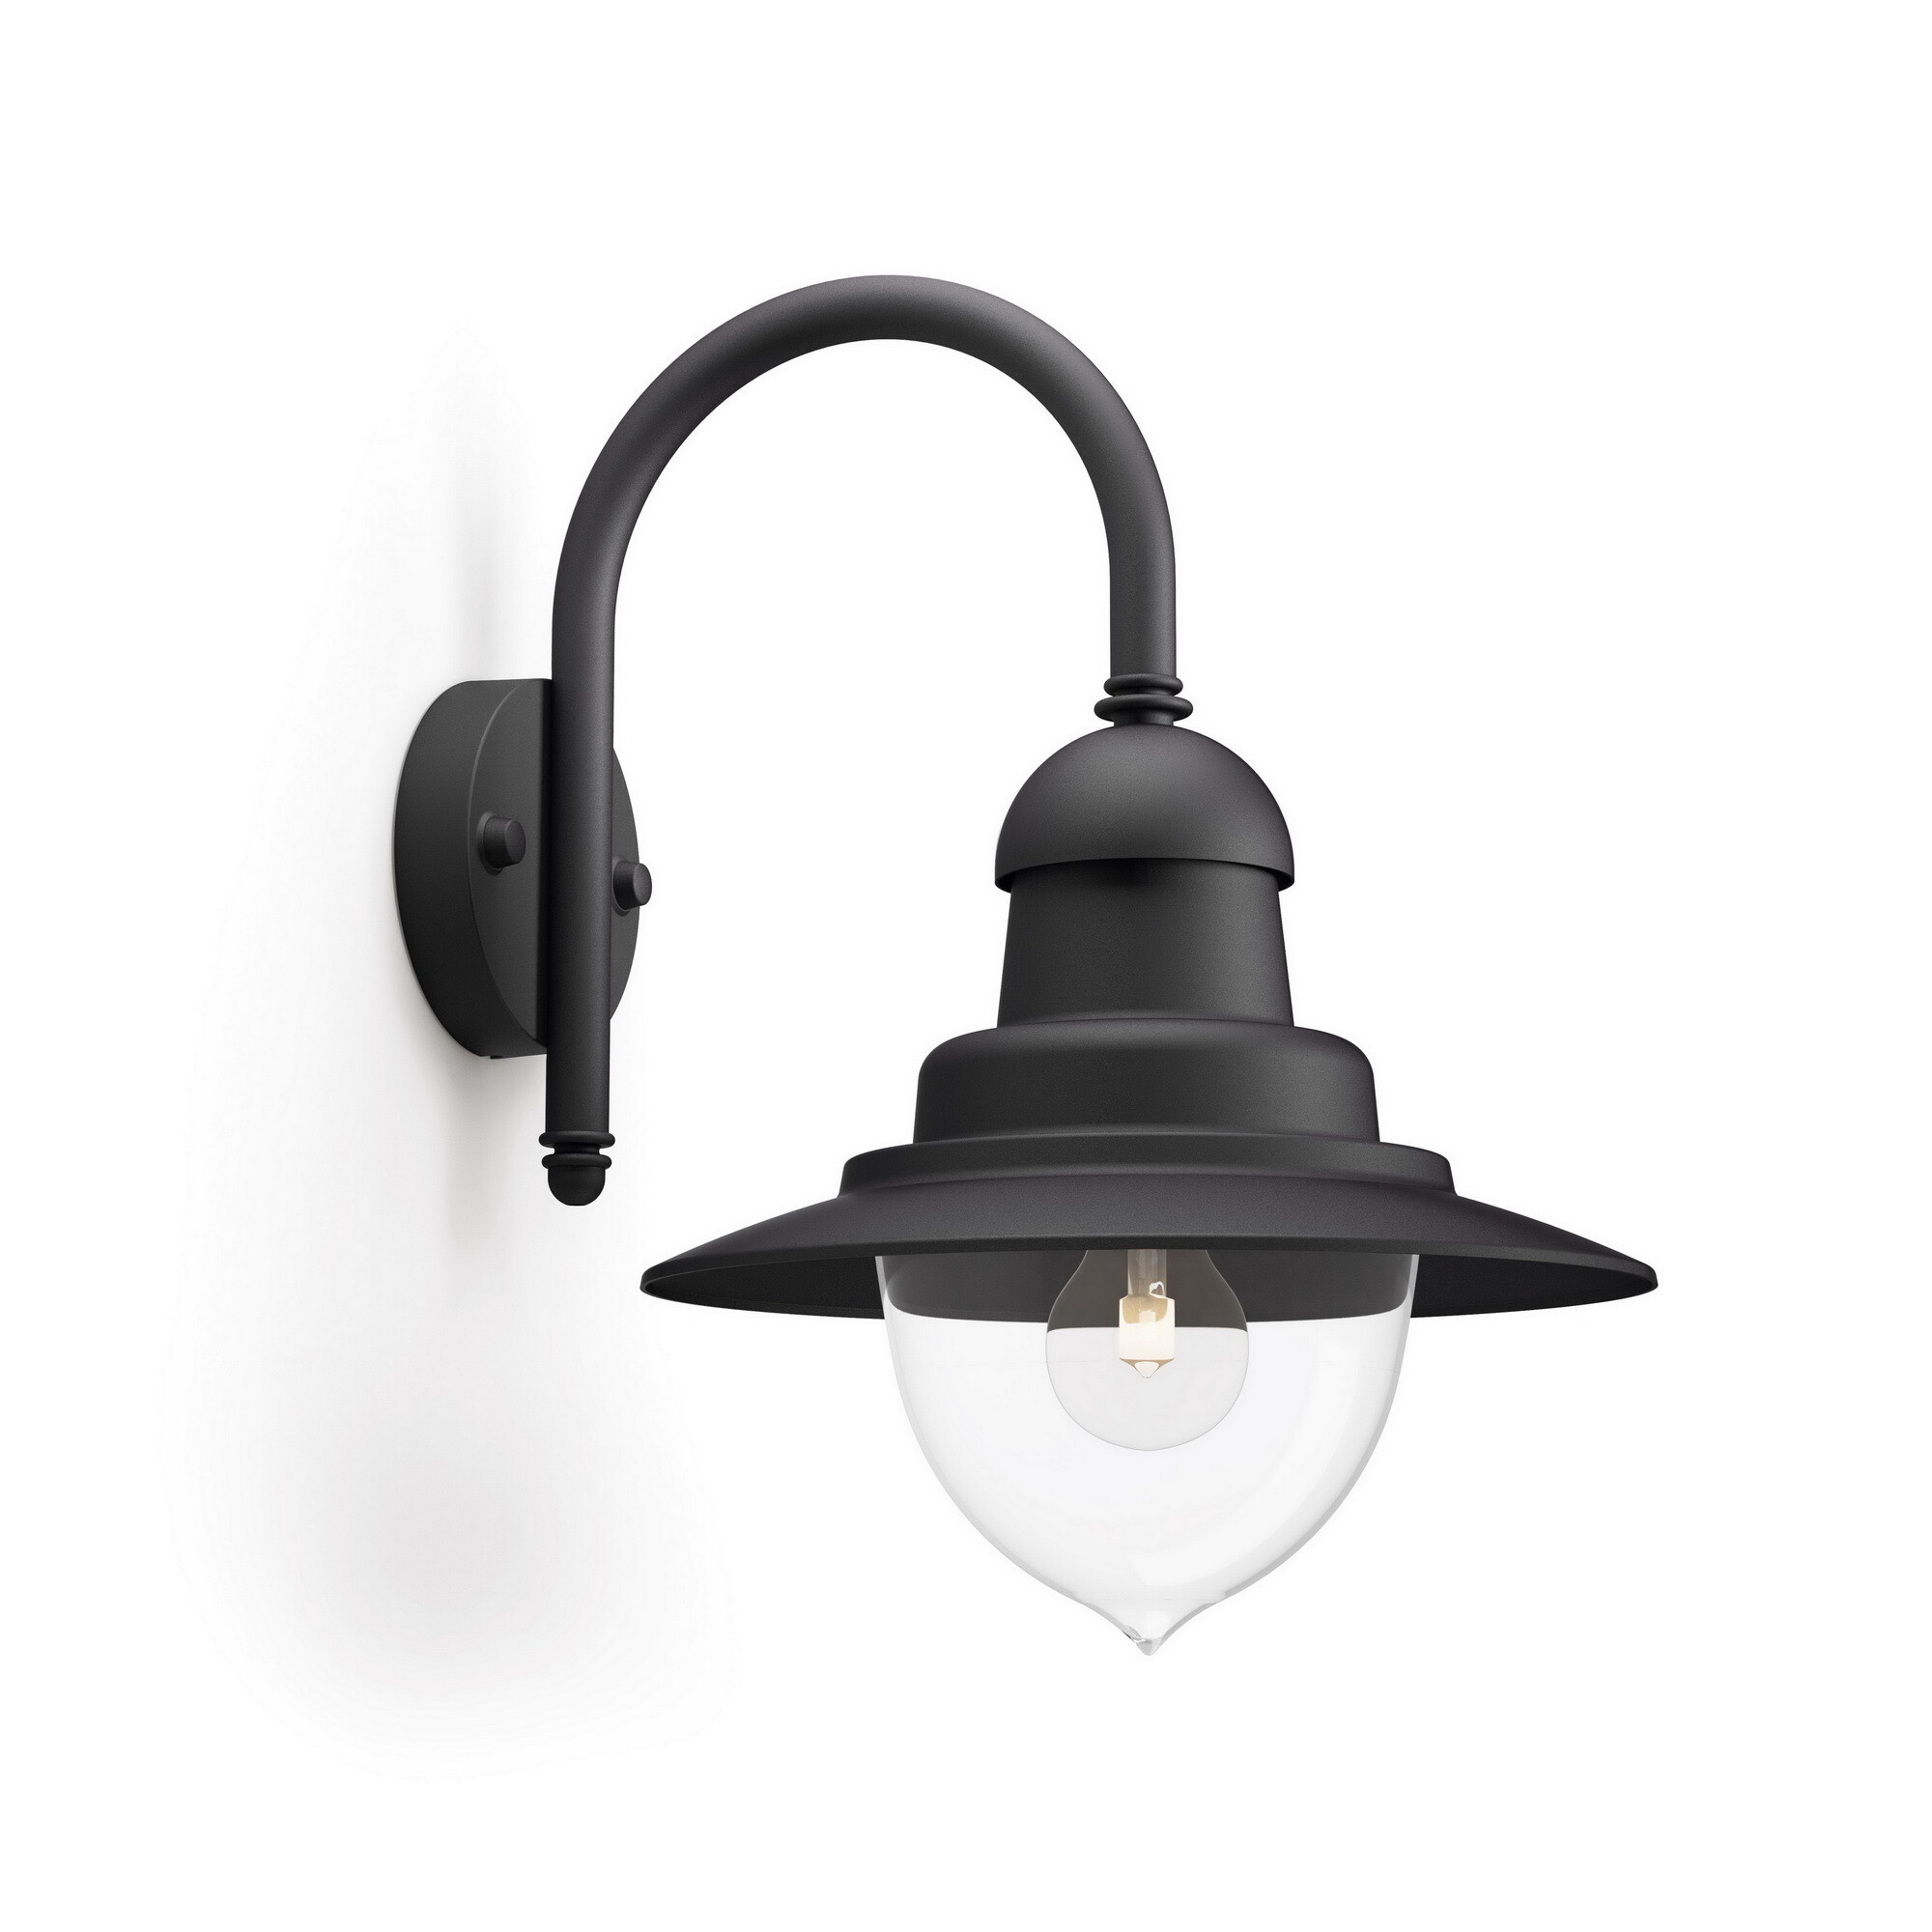 RAINDROP wandlampen